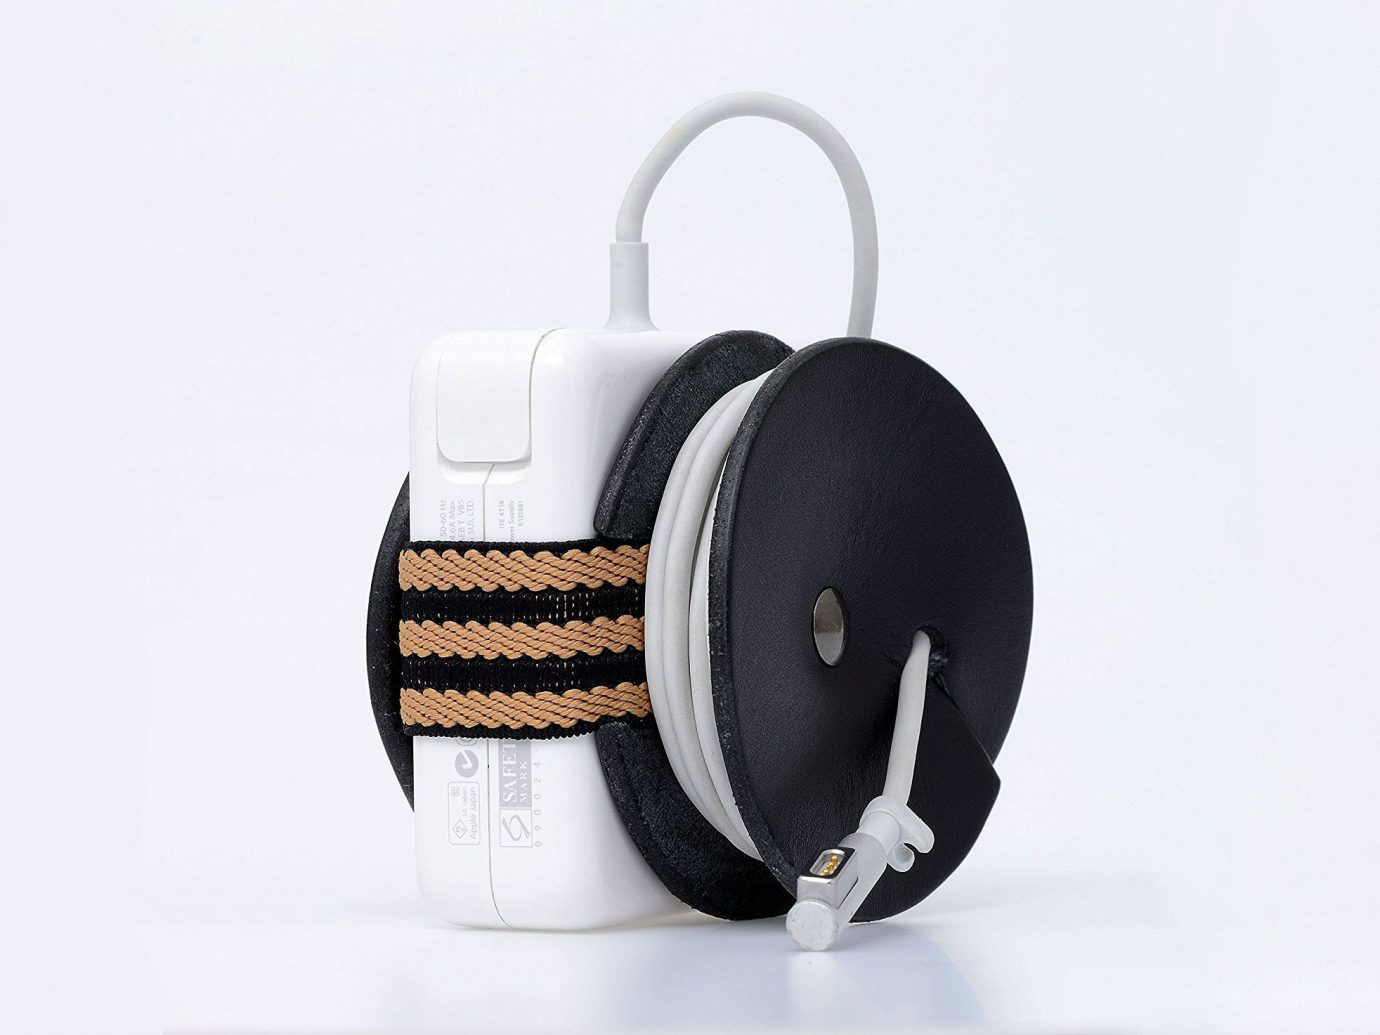 Style + Design headphones audio equipment gadget product technology brand audio hand human body electronic device